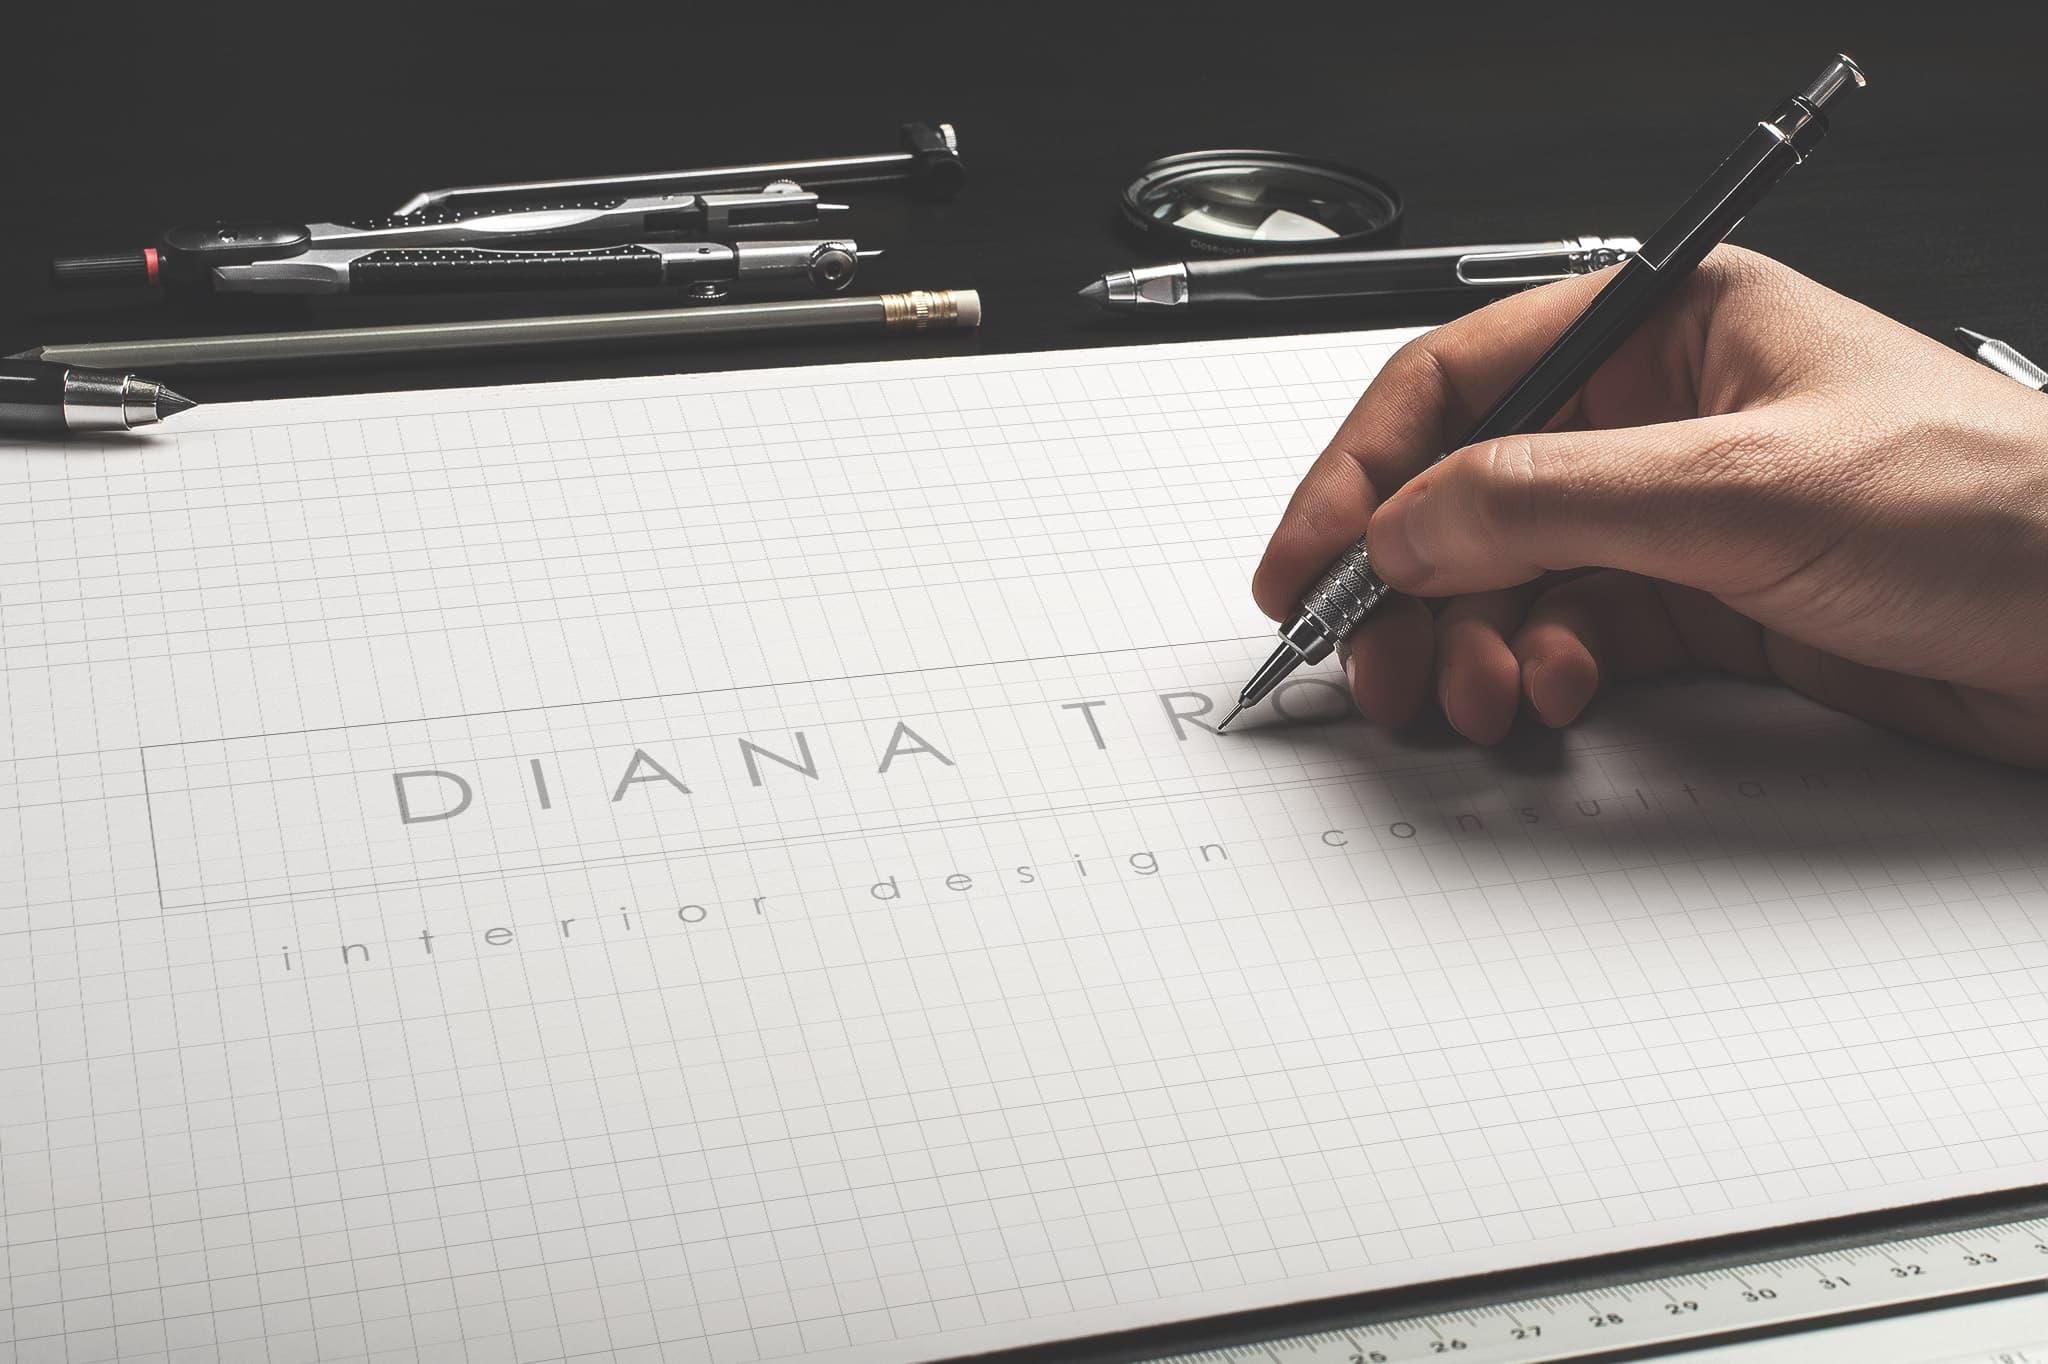 Diana-8